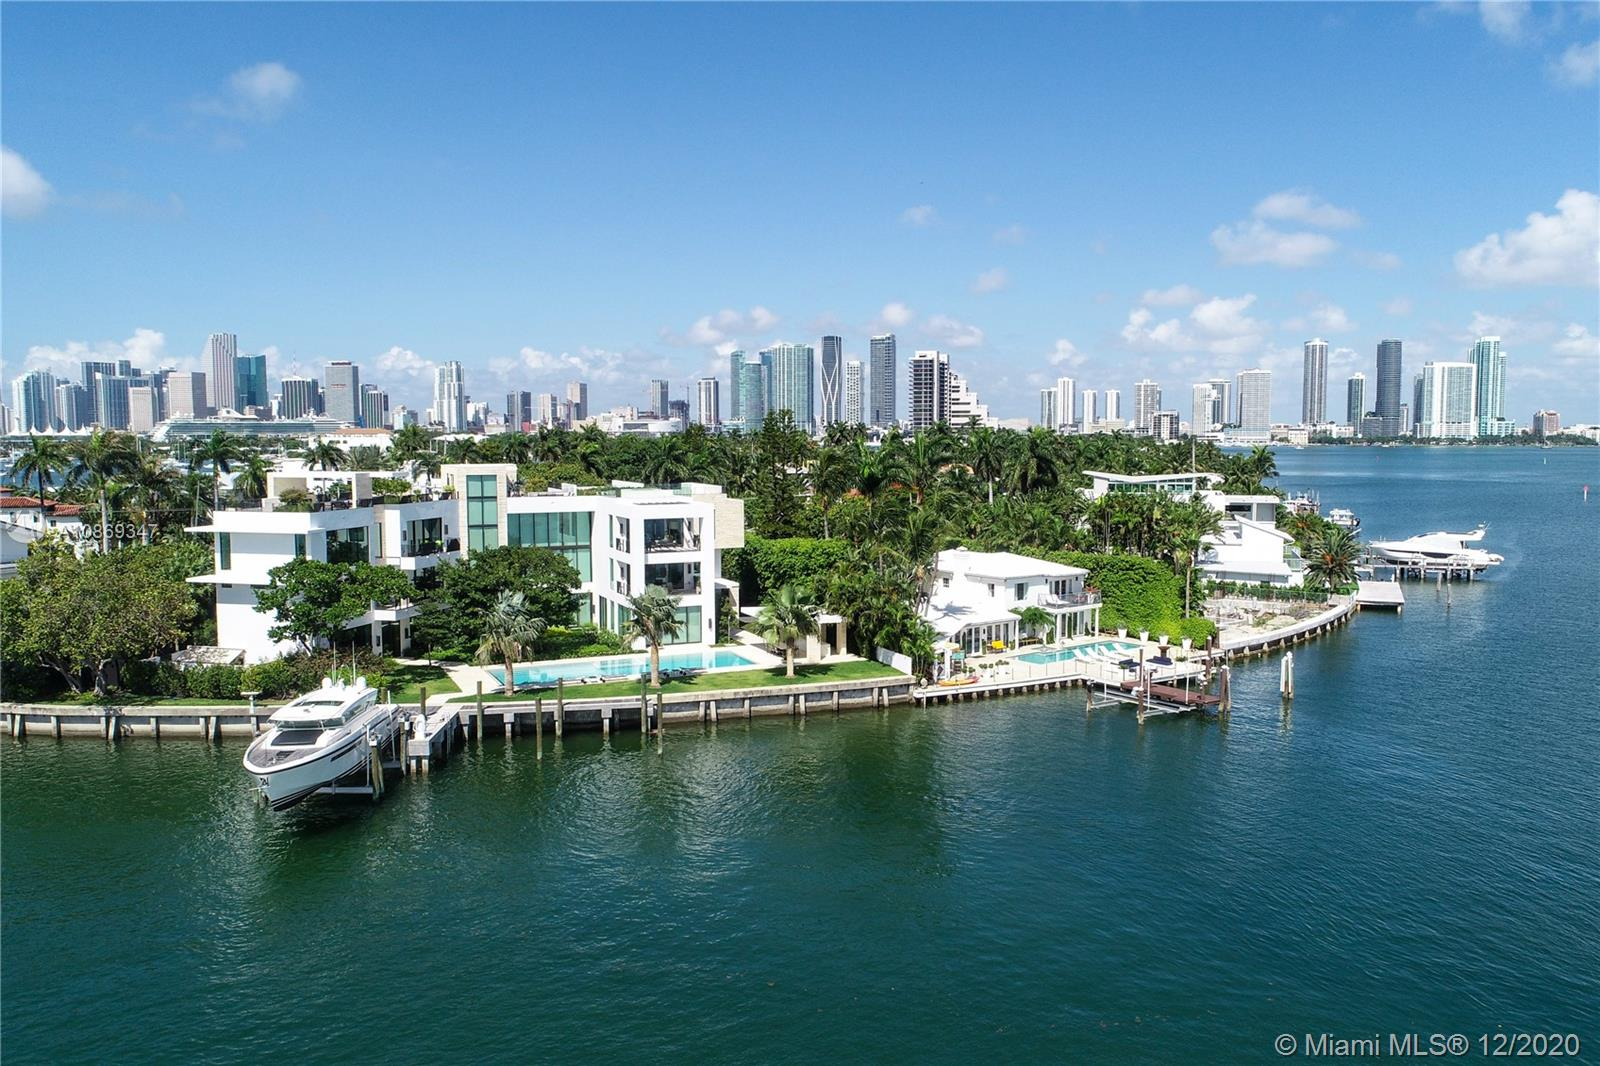 1429 N Venetian Way, Miami, Florida 33139